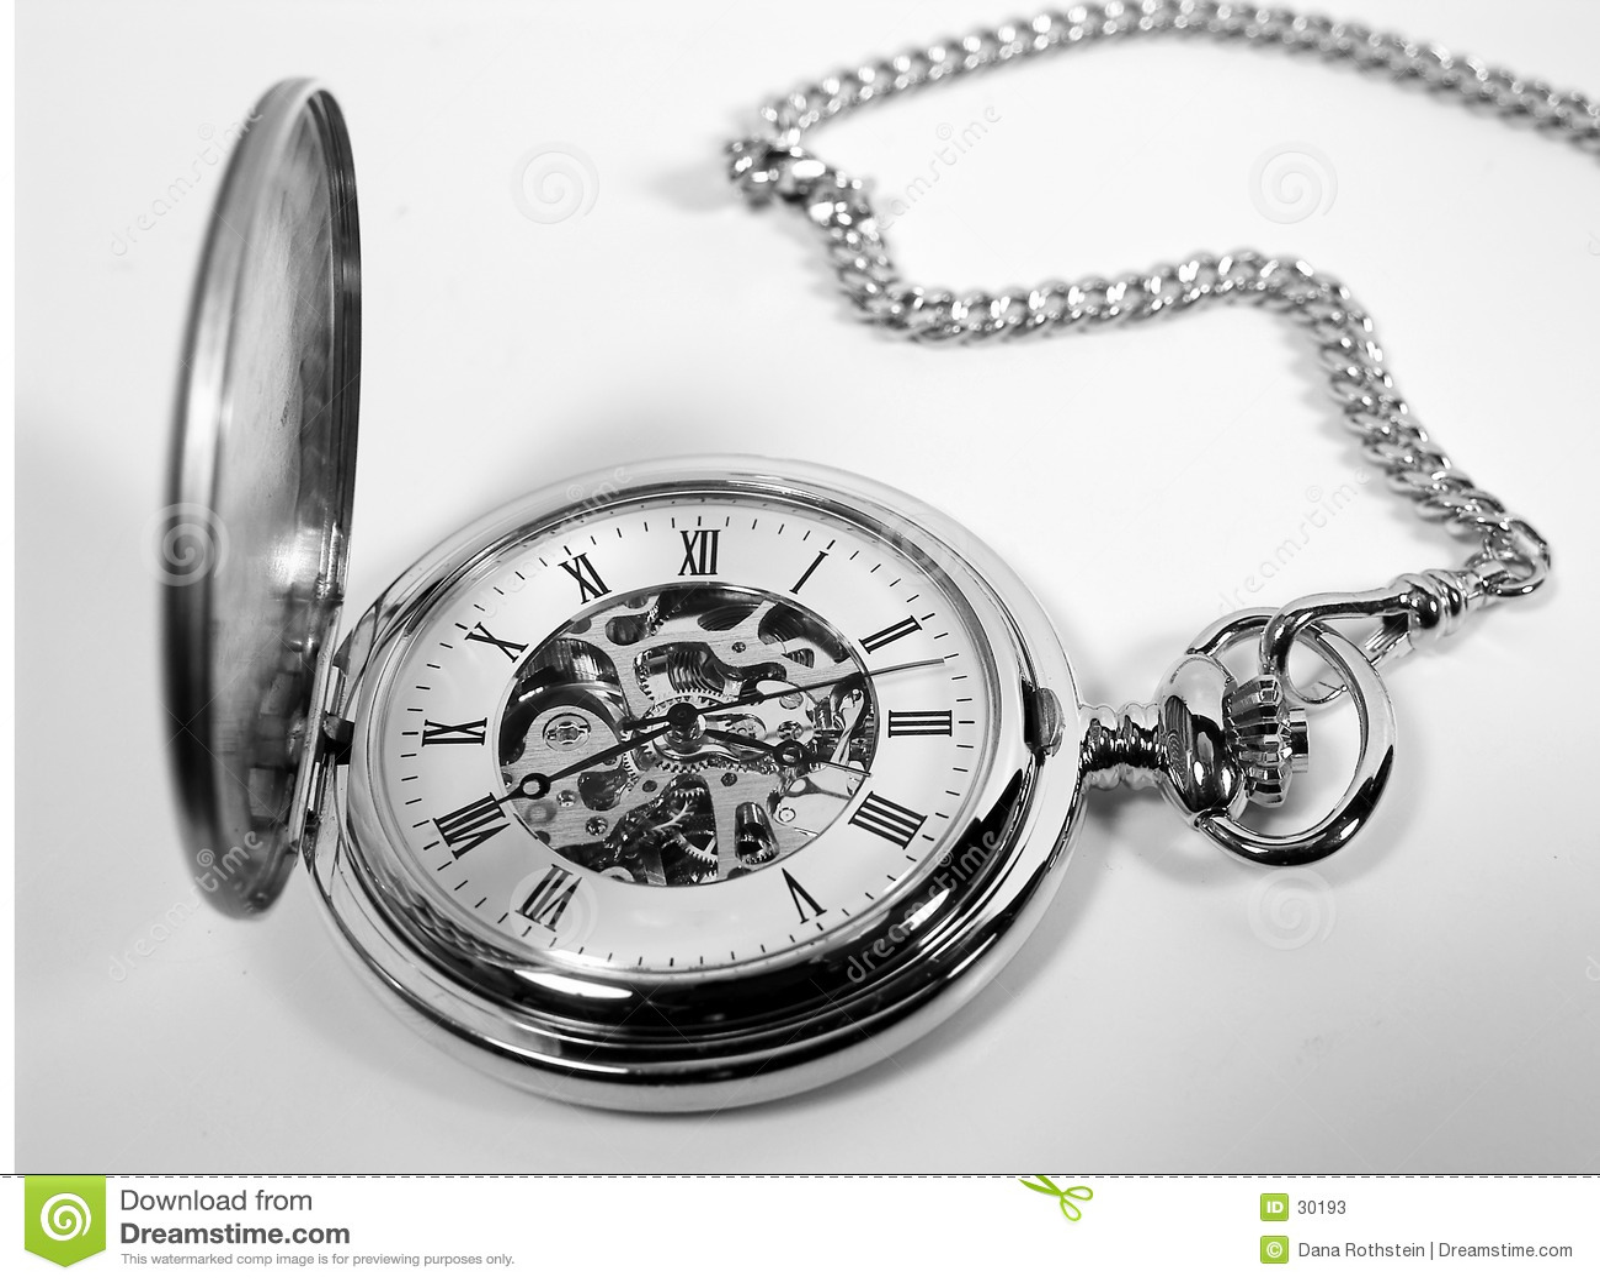 Antique Pocket Watch Stock Image Image Of Antique Stem 30193